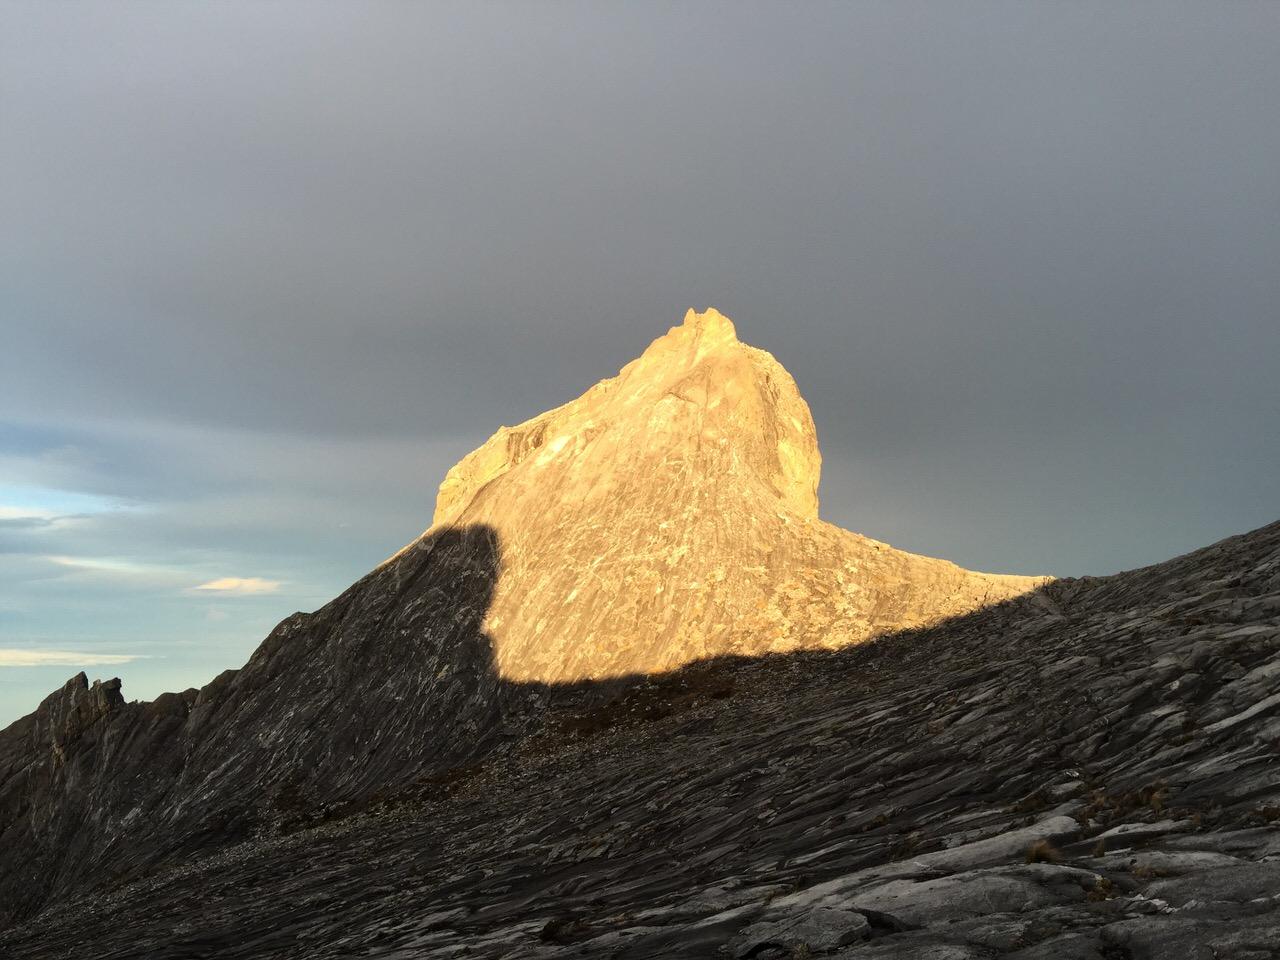 Kota Kinabalu climbing 4154